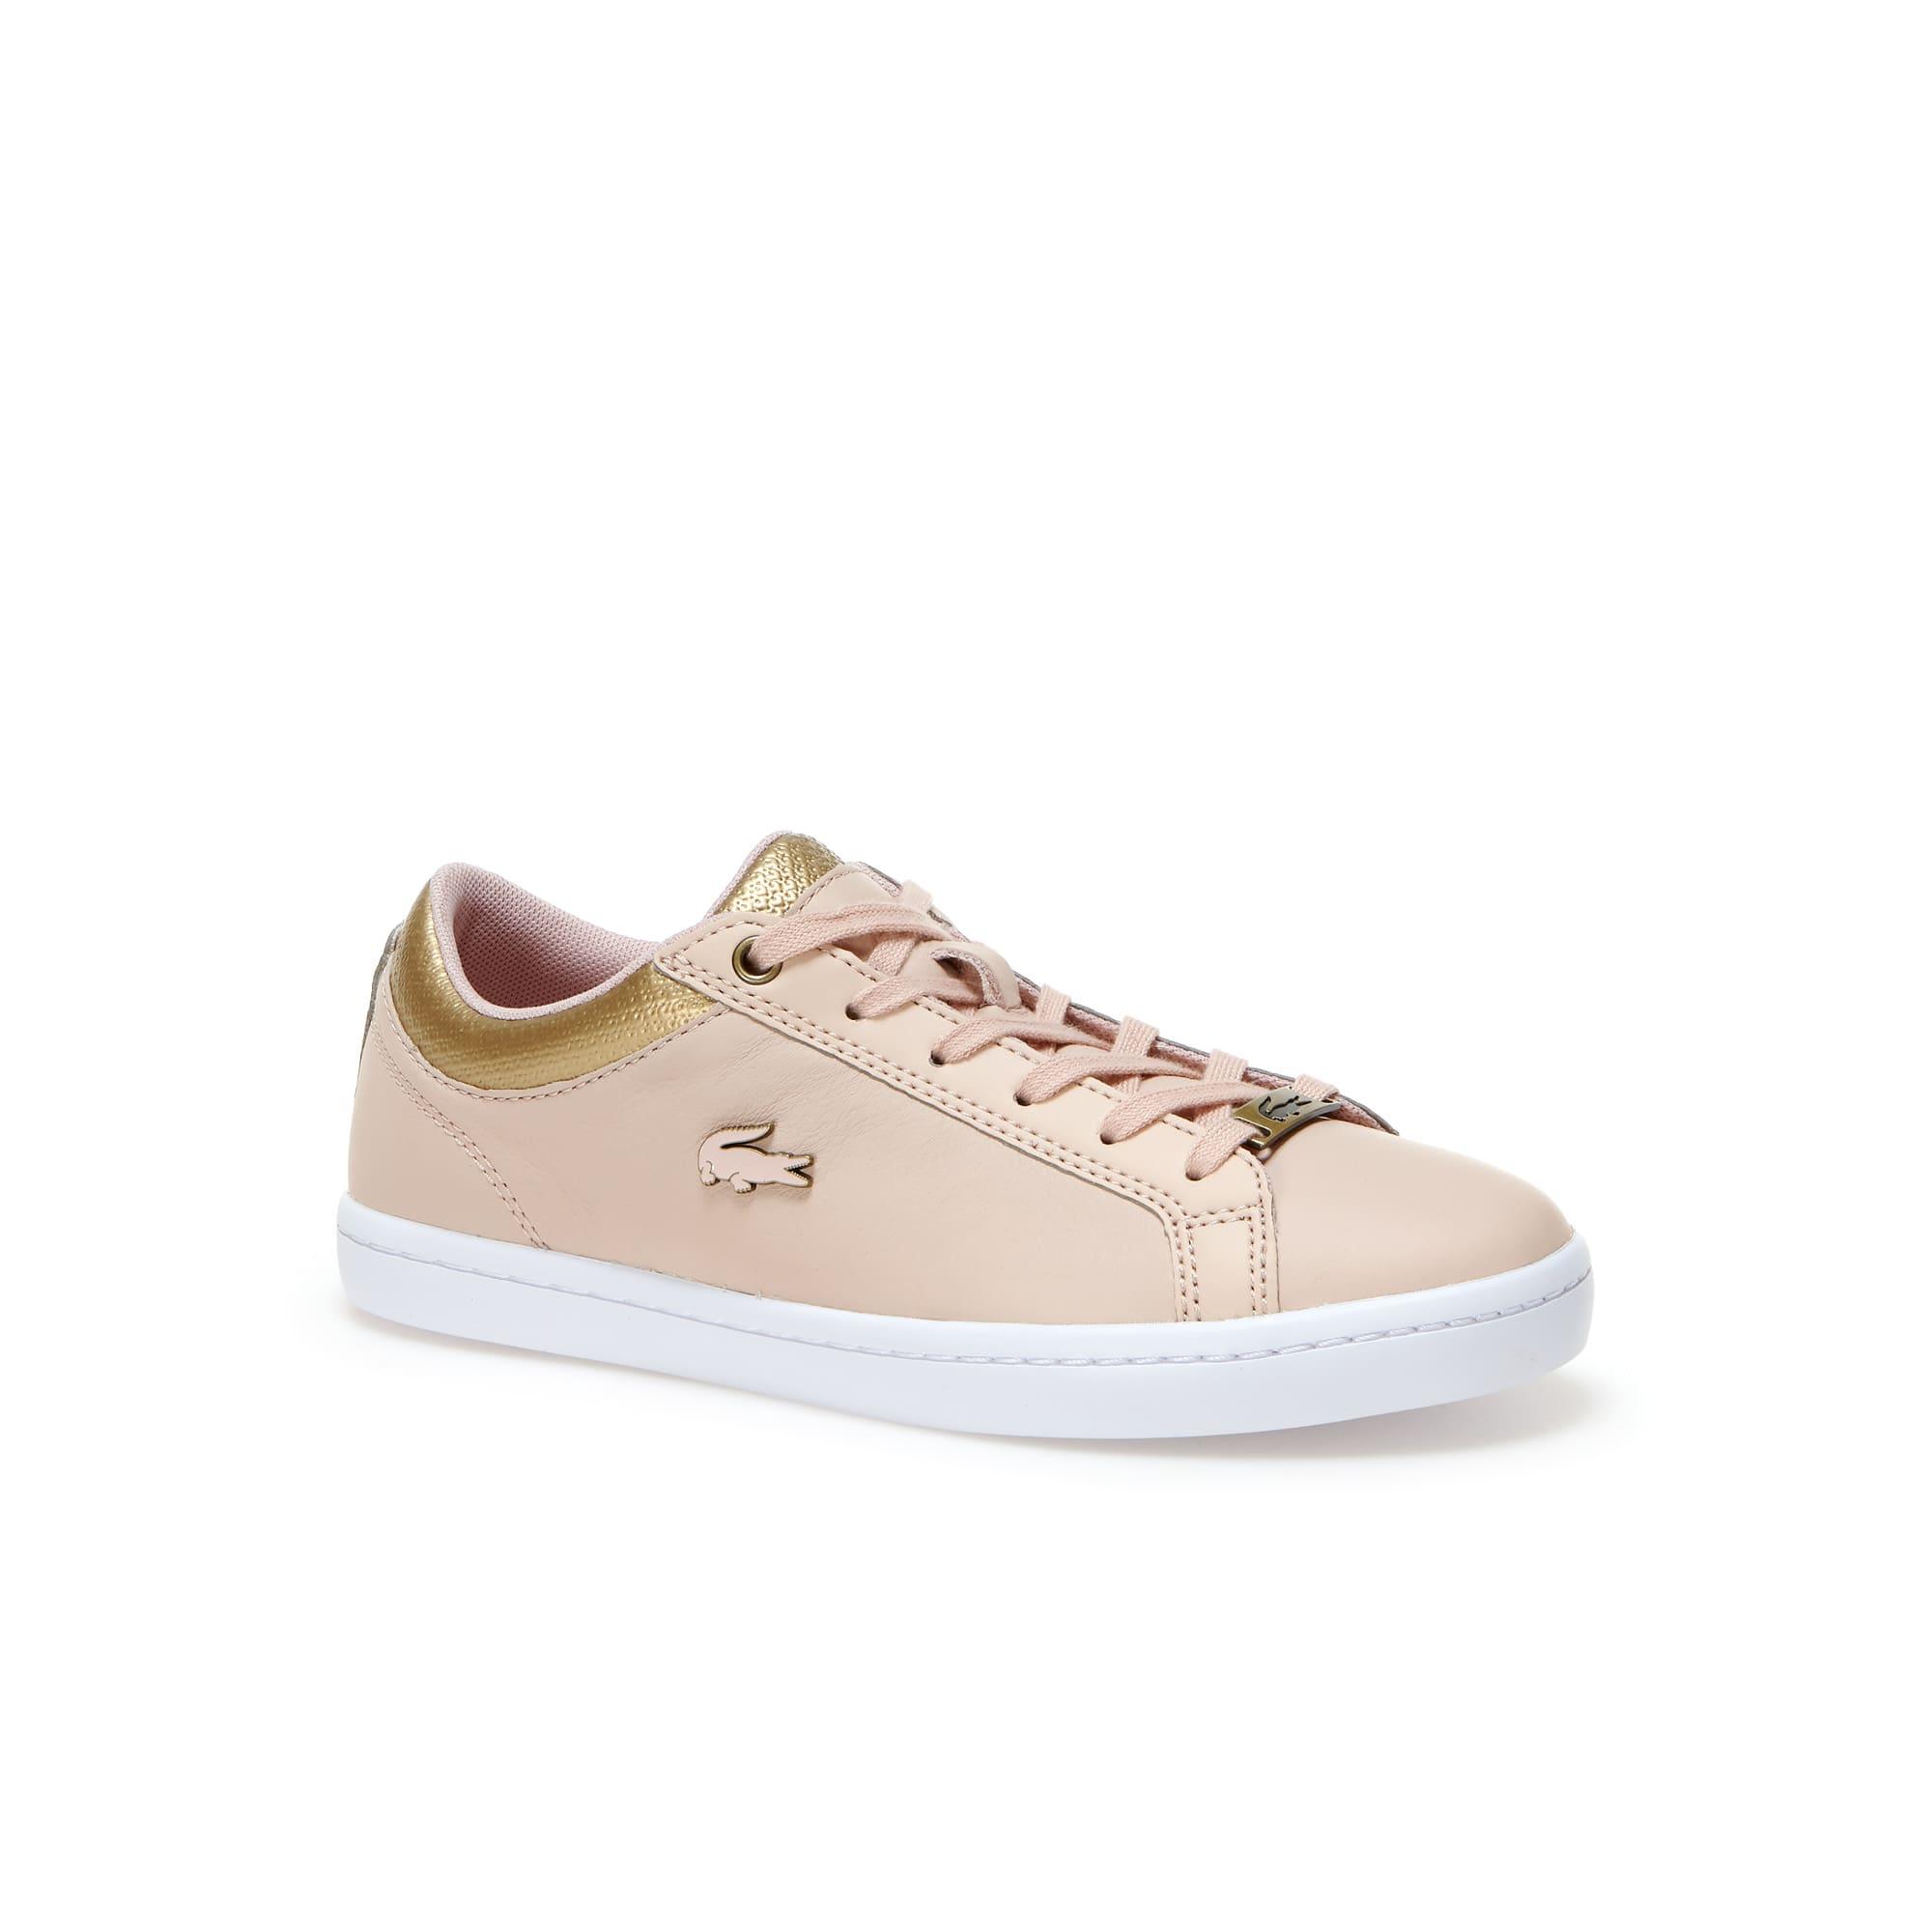 Sneakers Straightset in pelle bottalata